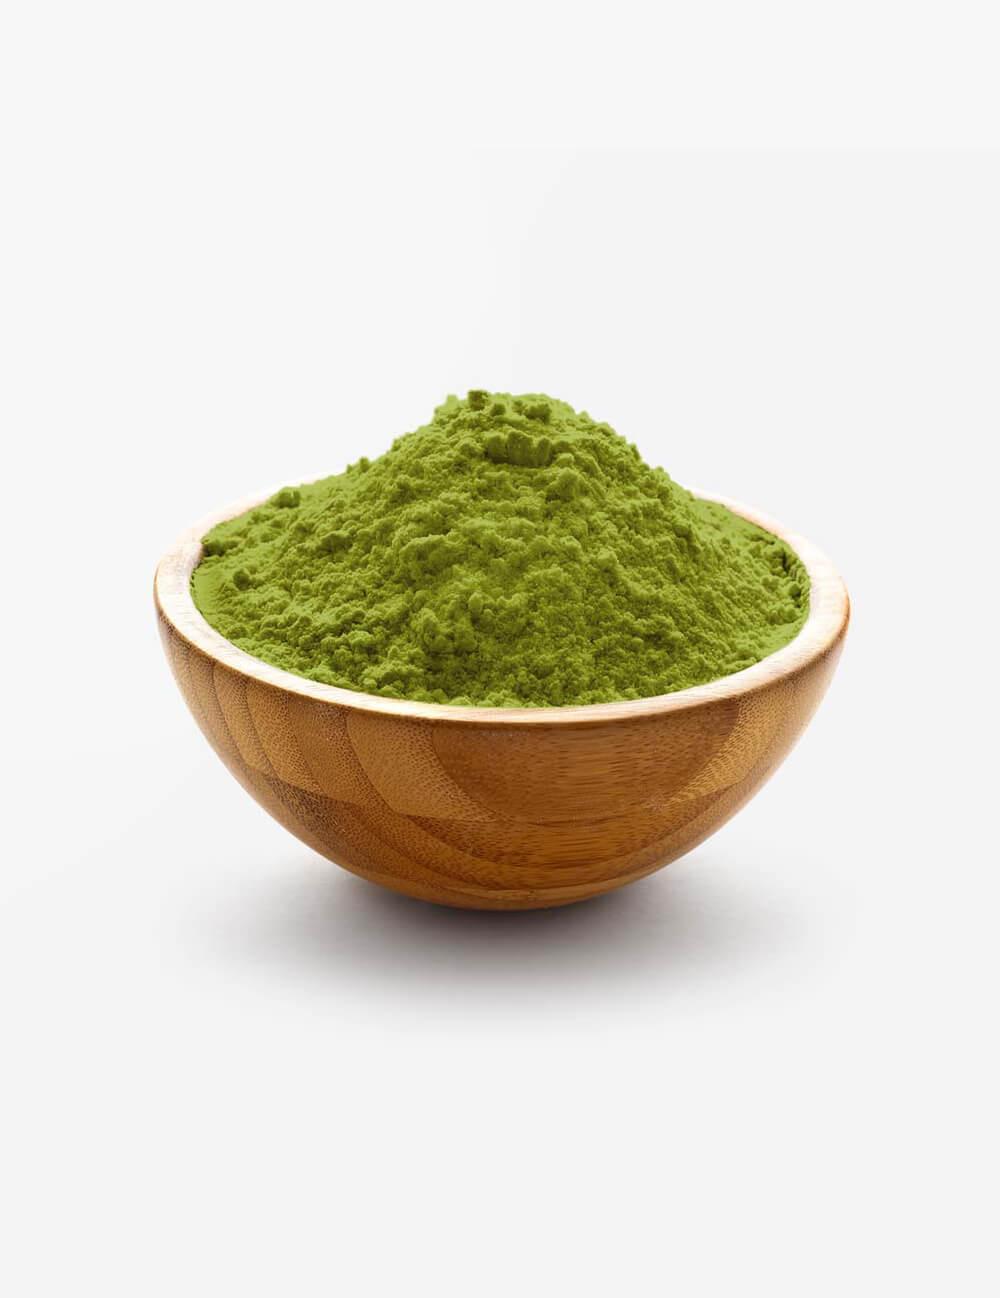 Green Coffee Bean Image 4